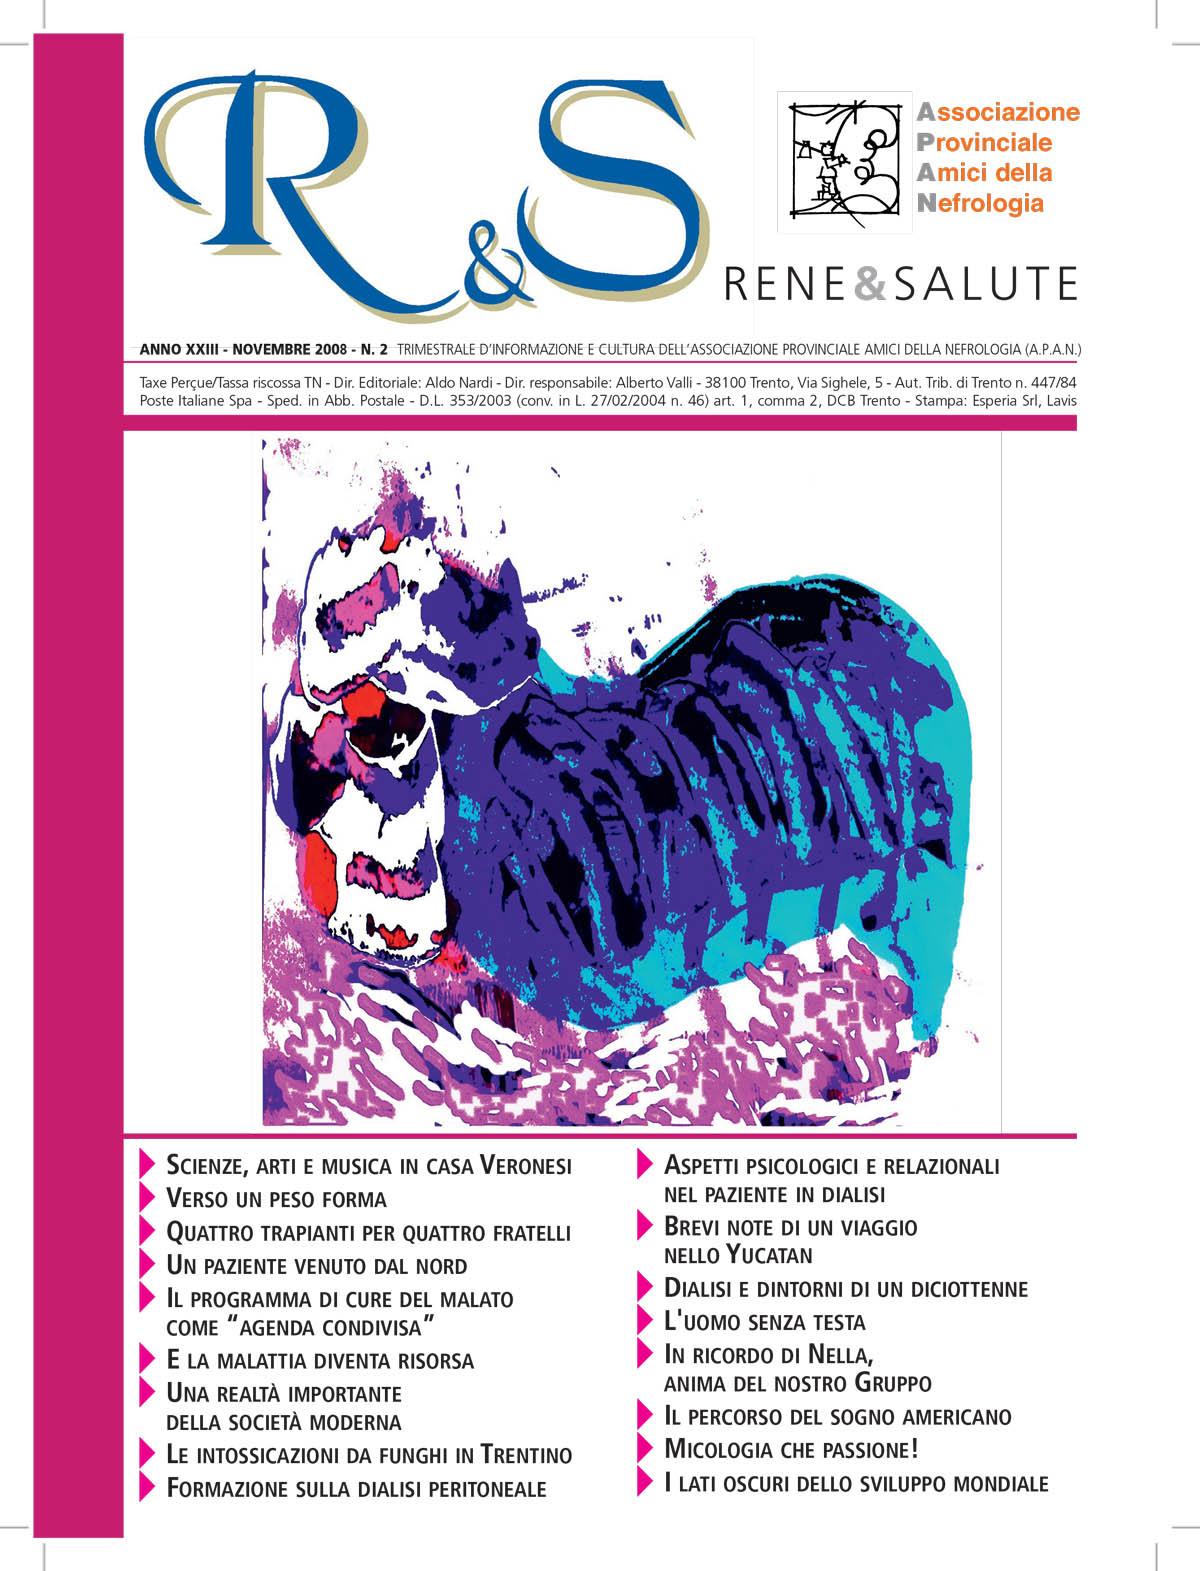 Rene & Salute 2008.2